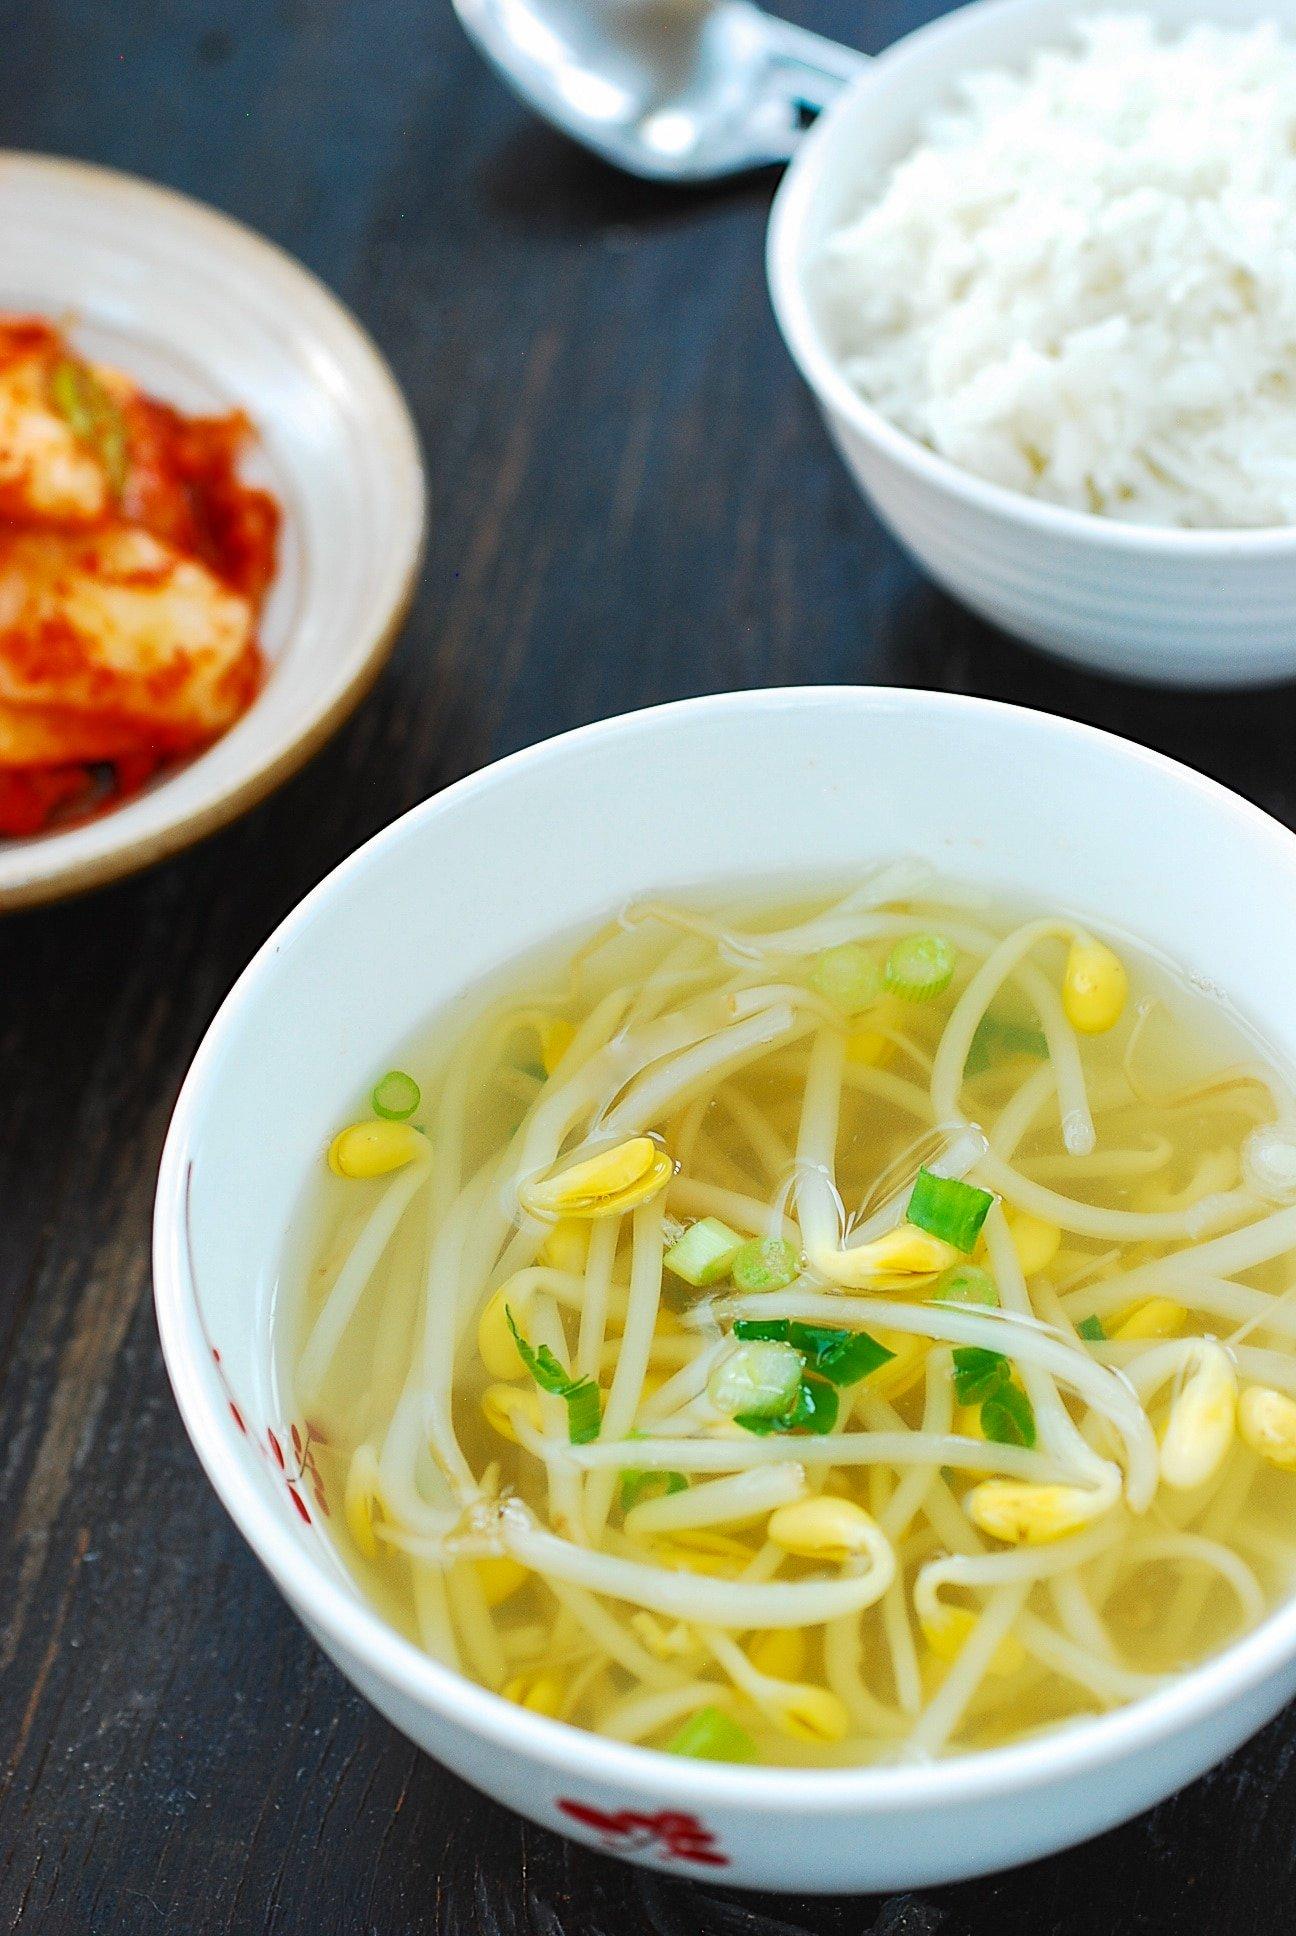 DSC 1896 2 - Kongnamul Guk (Soybean Sprout Soup)